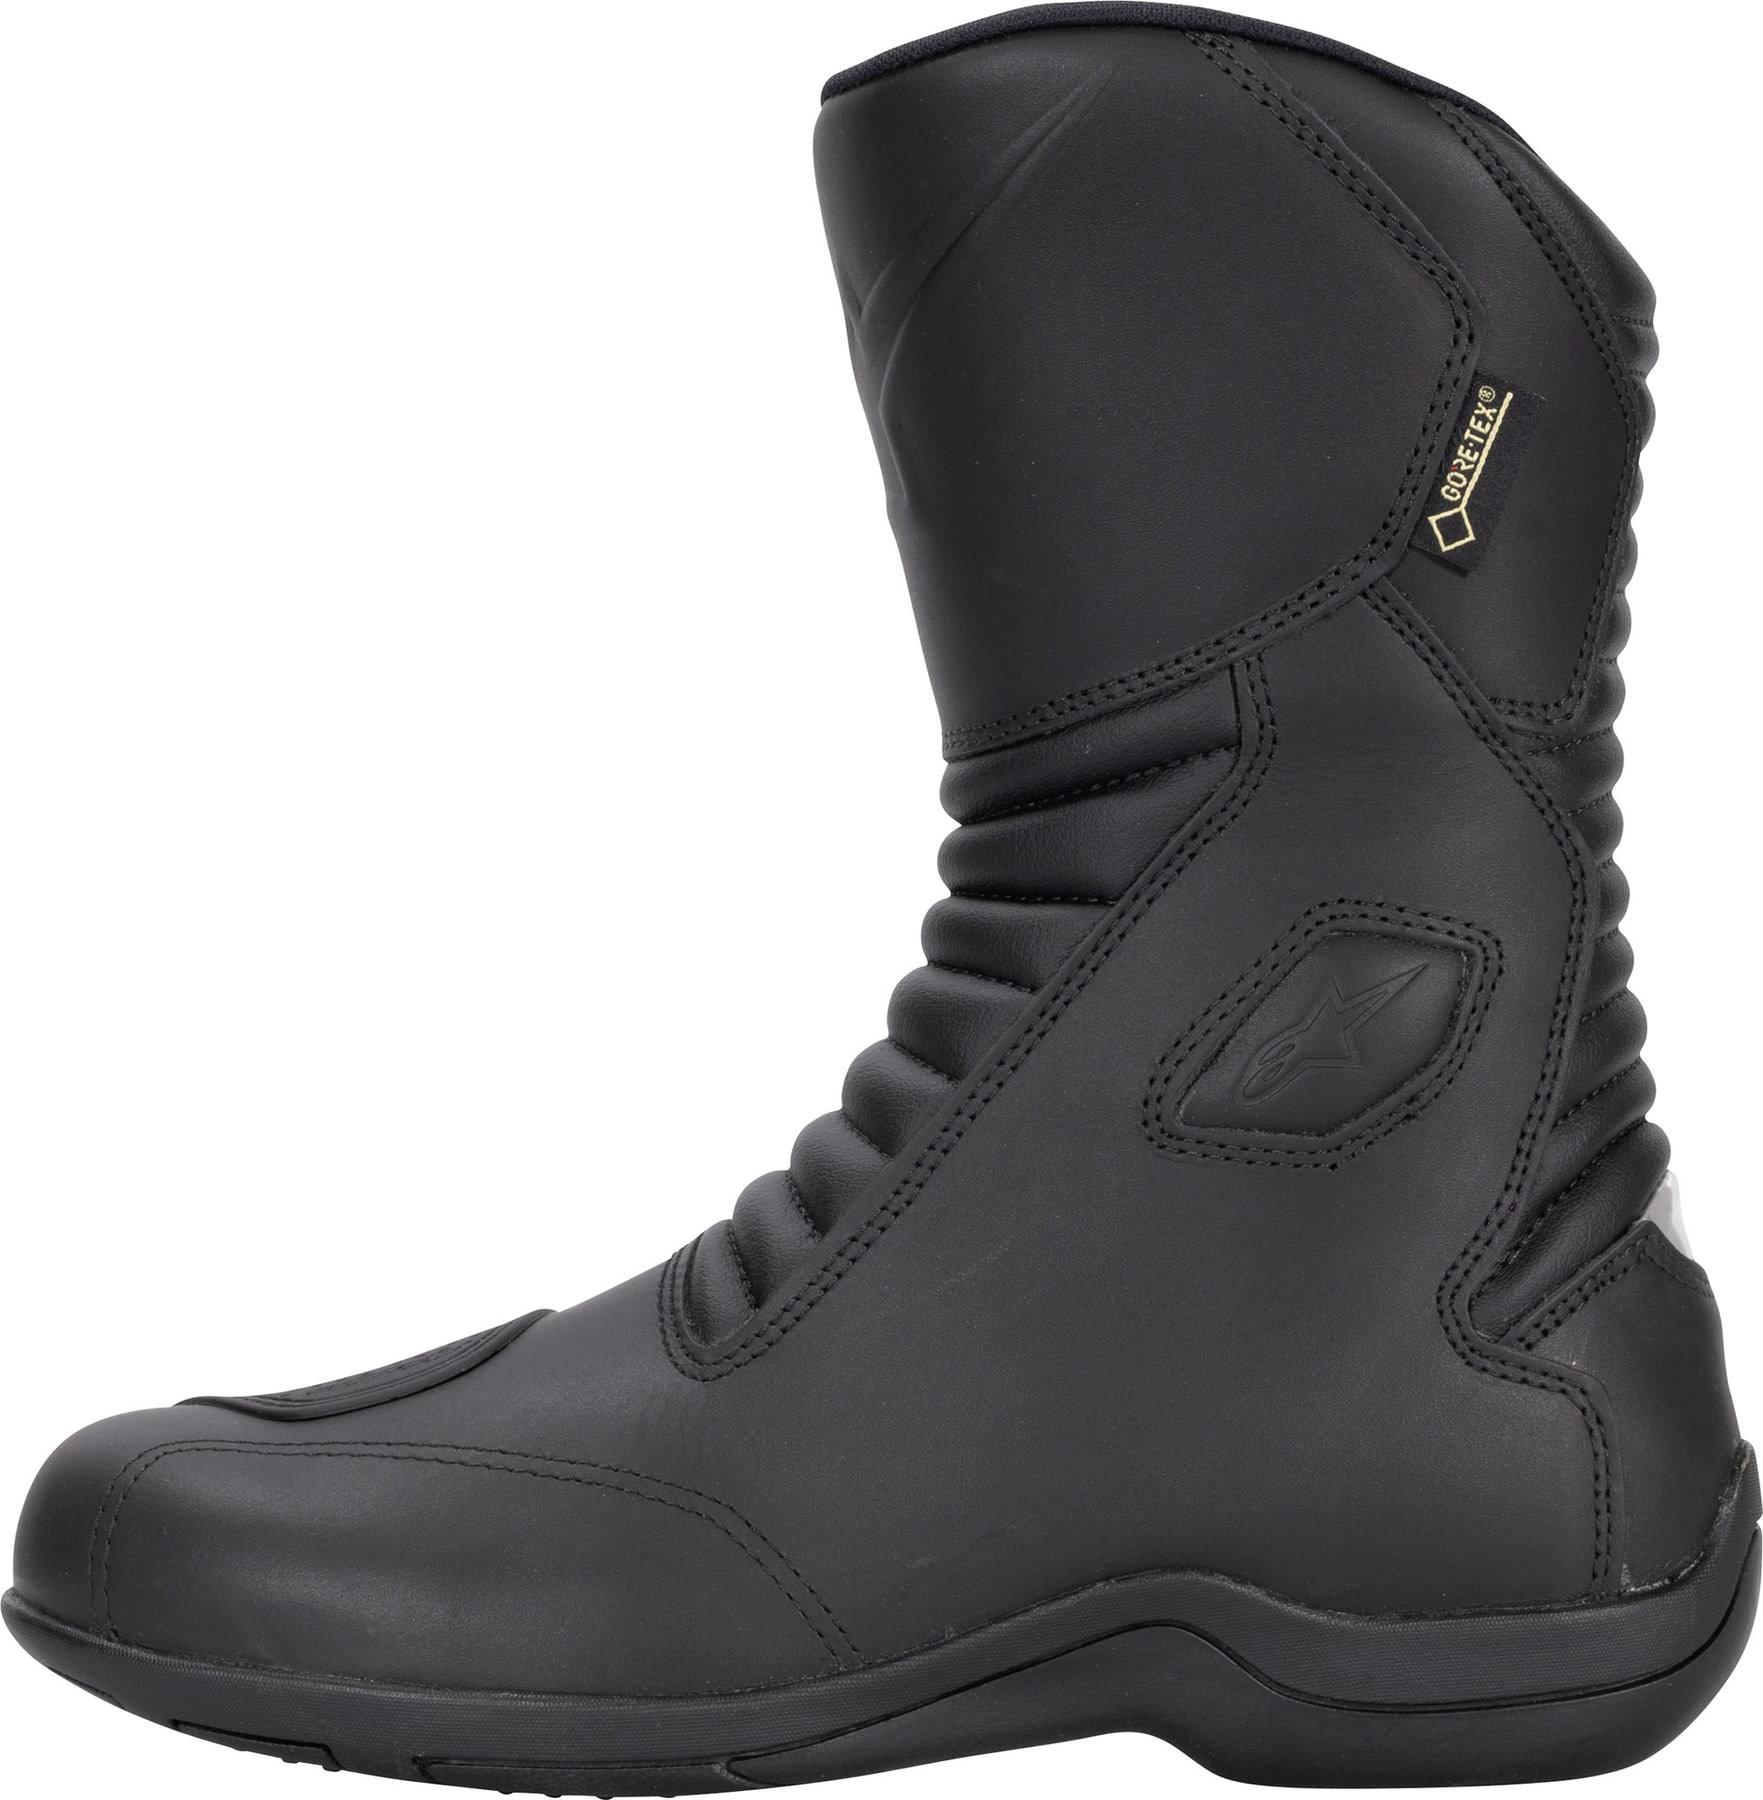 Buy Alpinestars Web Gore-Tex Boots